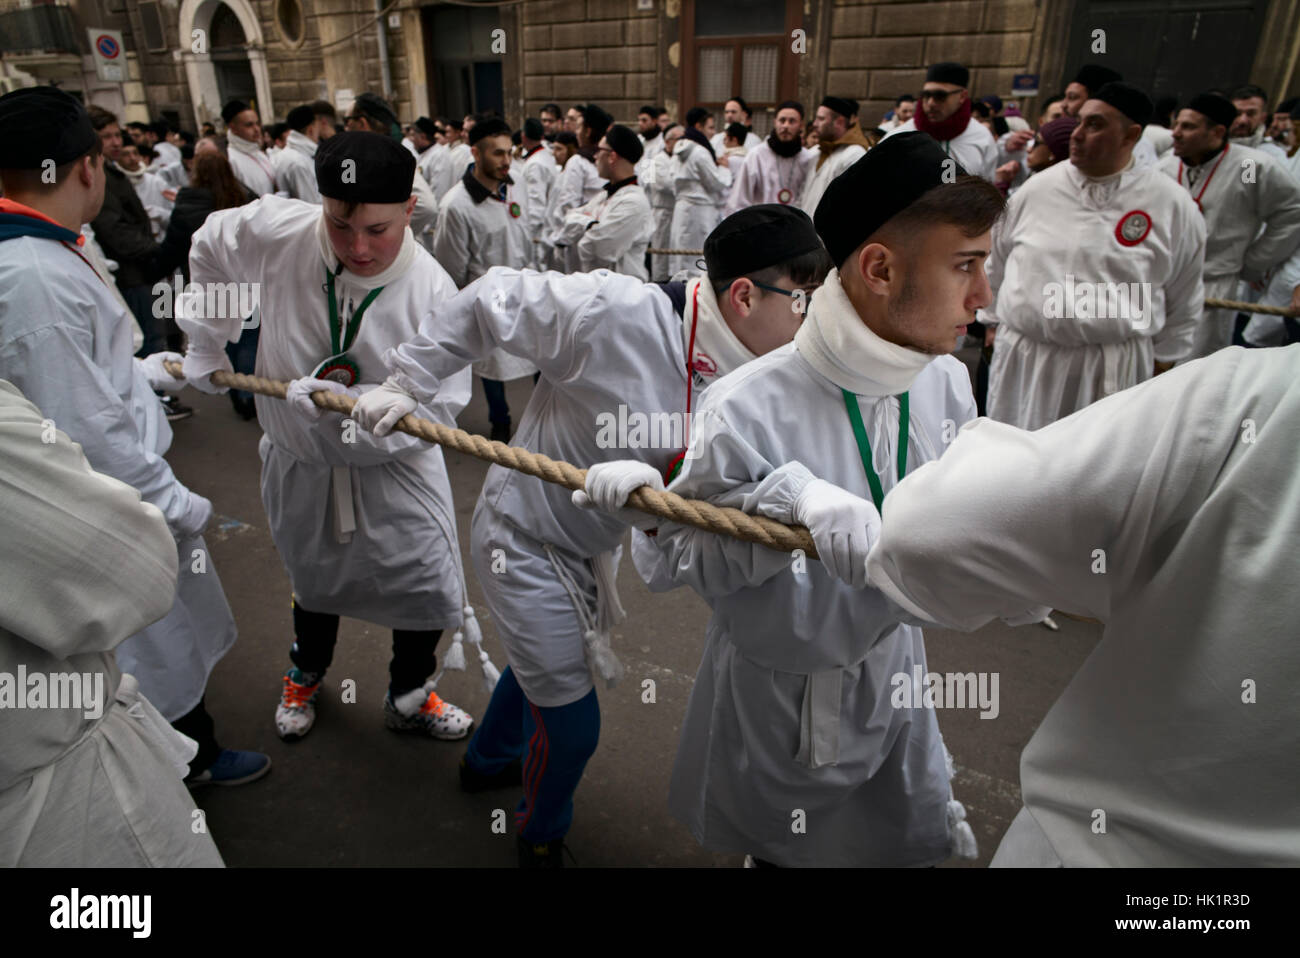 Catania, Sizilien, Italien, 4. Februar 2017. Männer, Frauen und ...